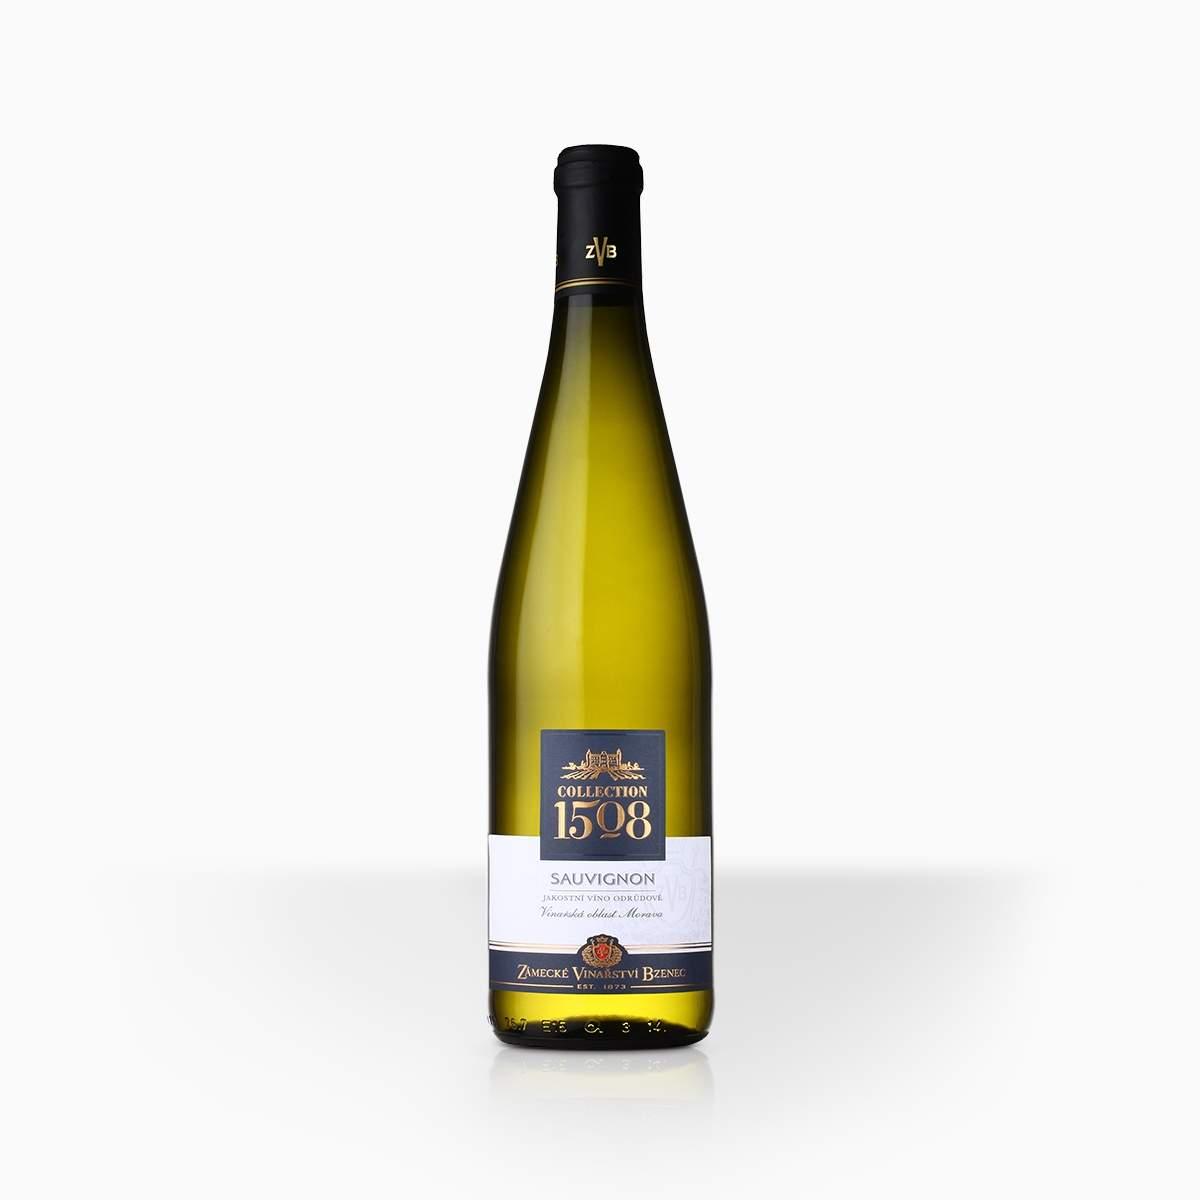 Víno ZVB Collection 1508 Sauvignon 12,3% 0,75l